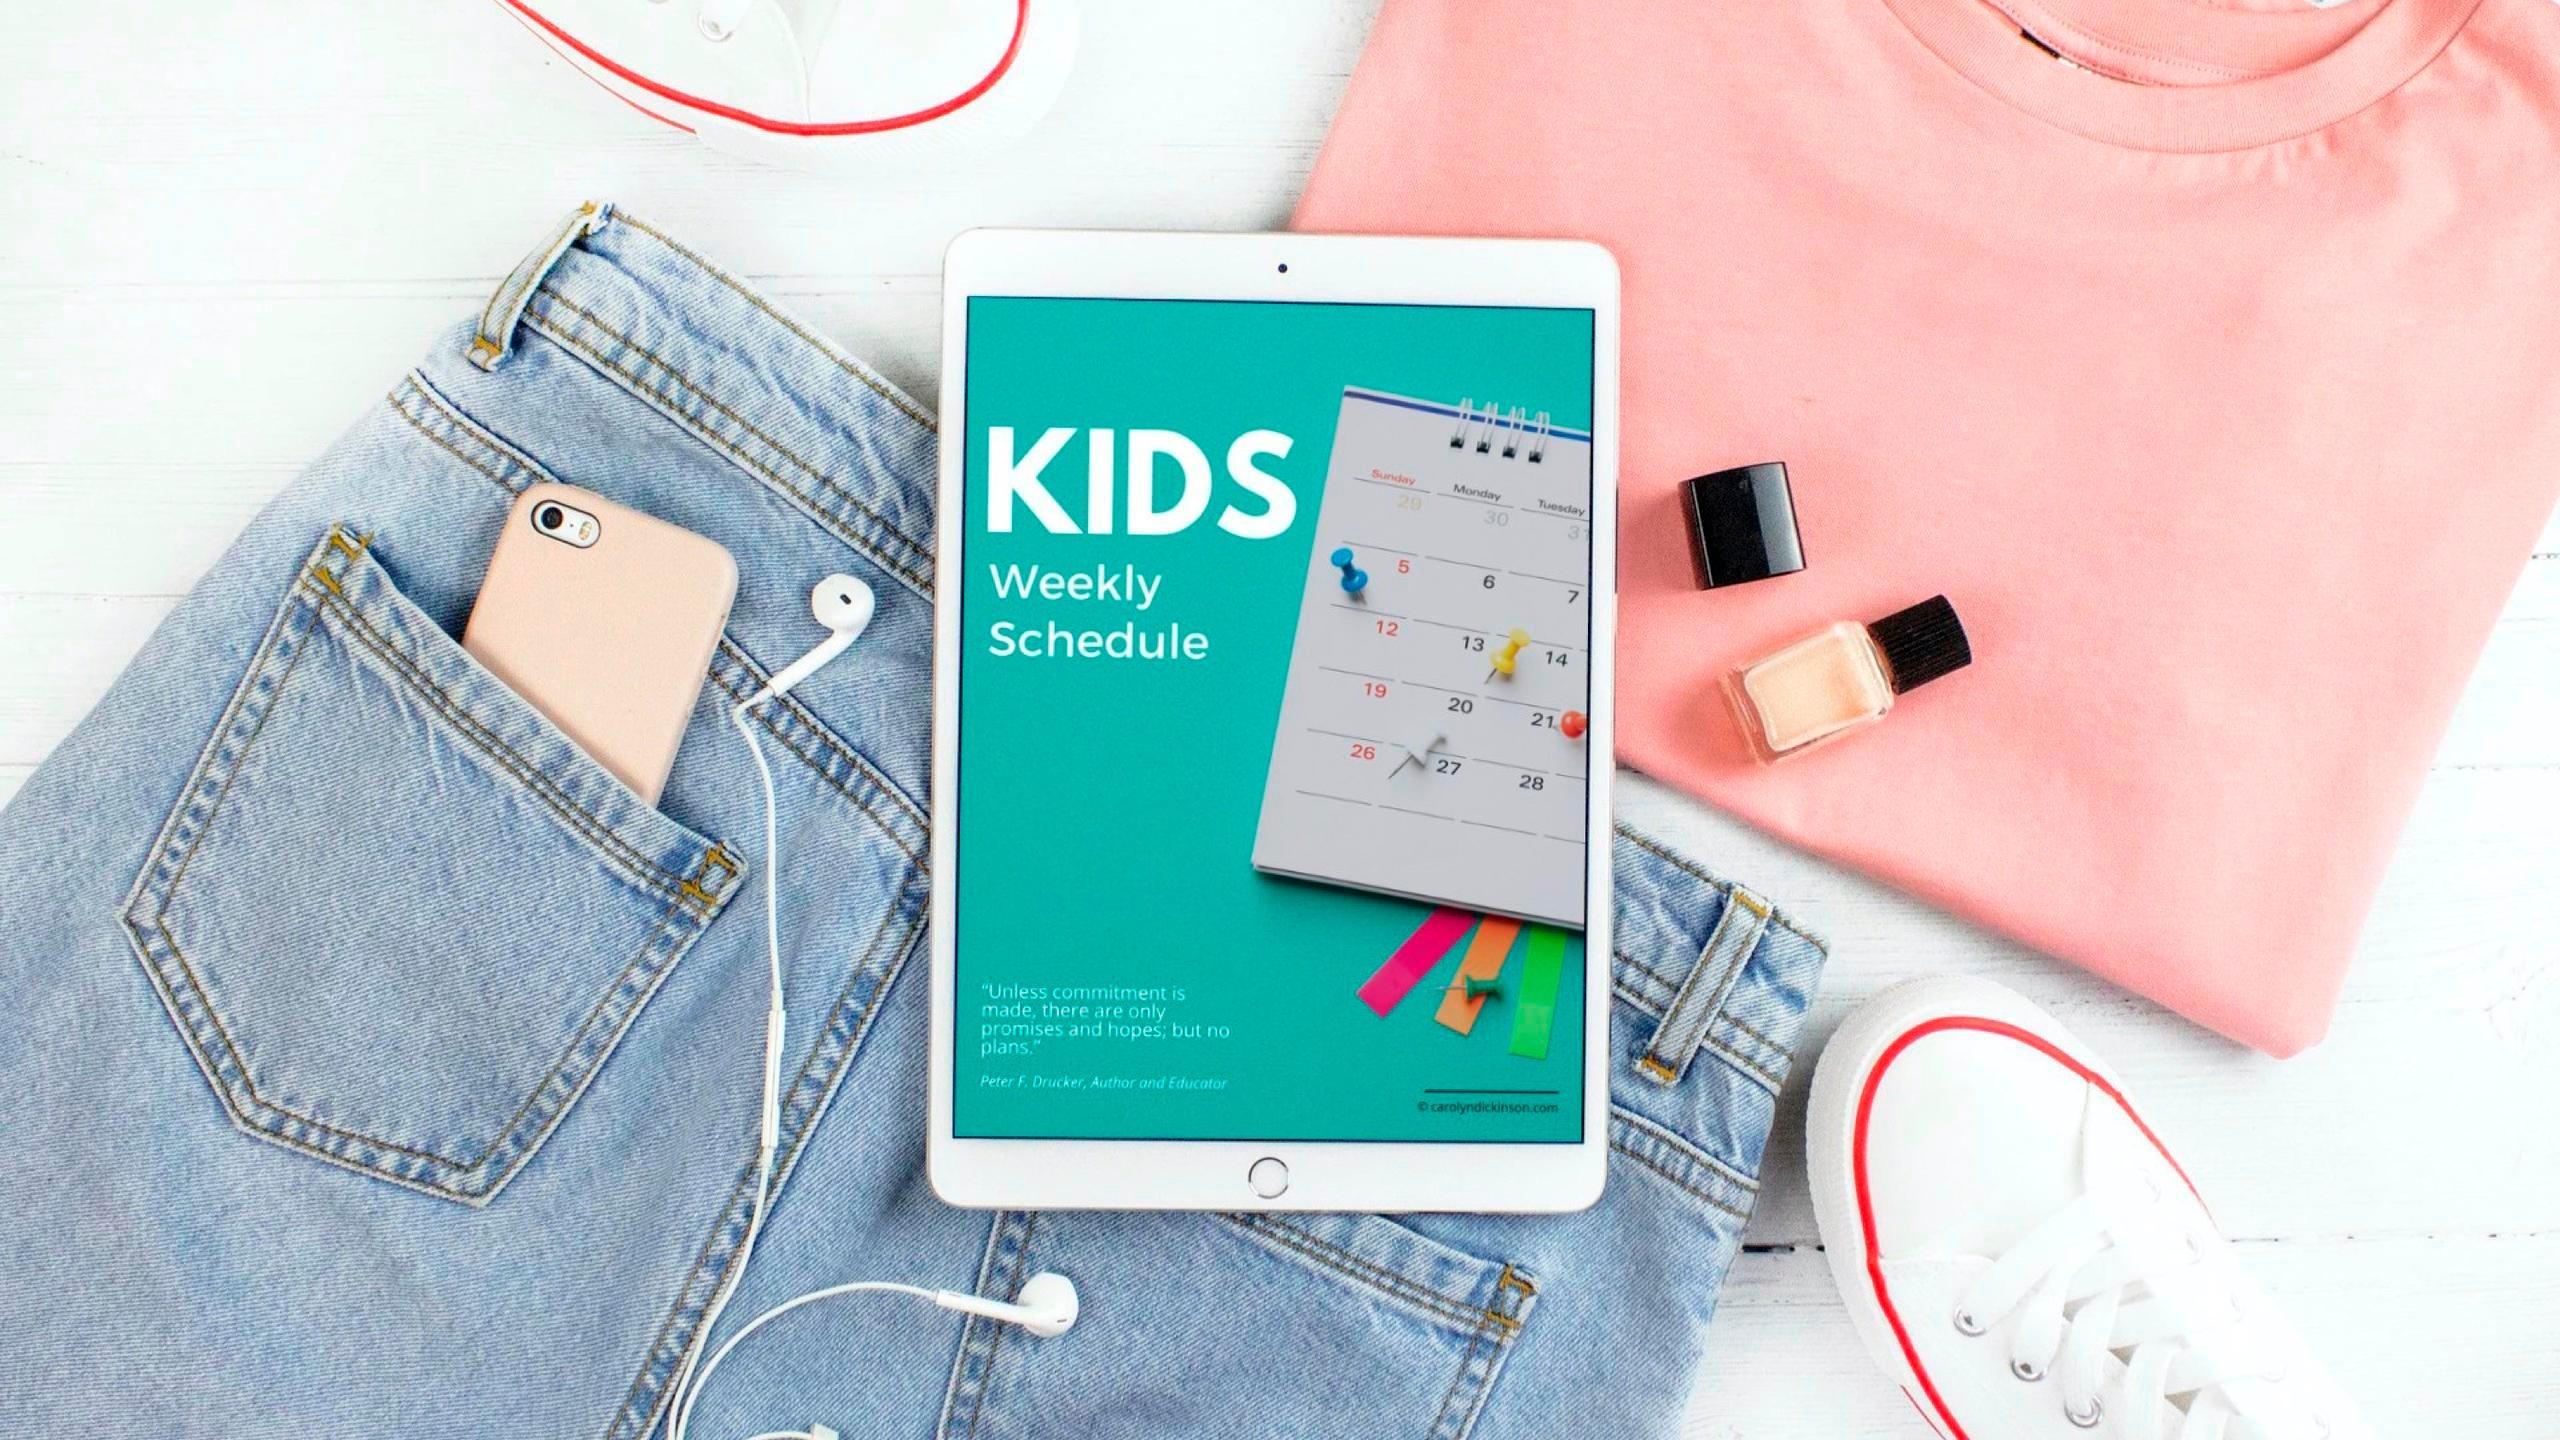 Kids Weekly Schedule Download